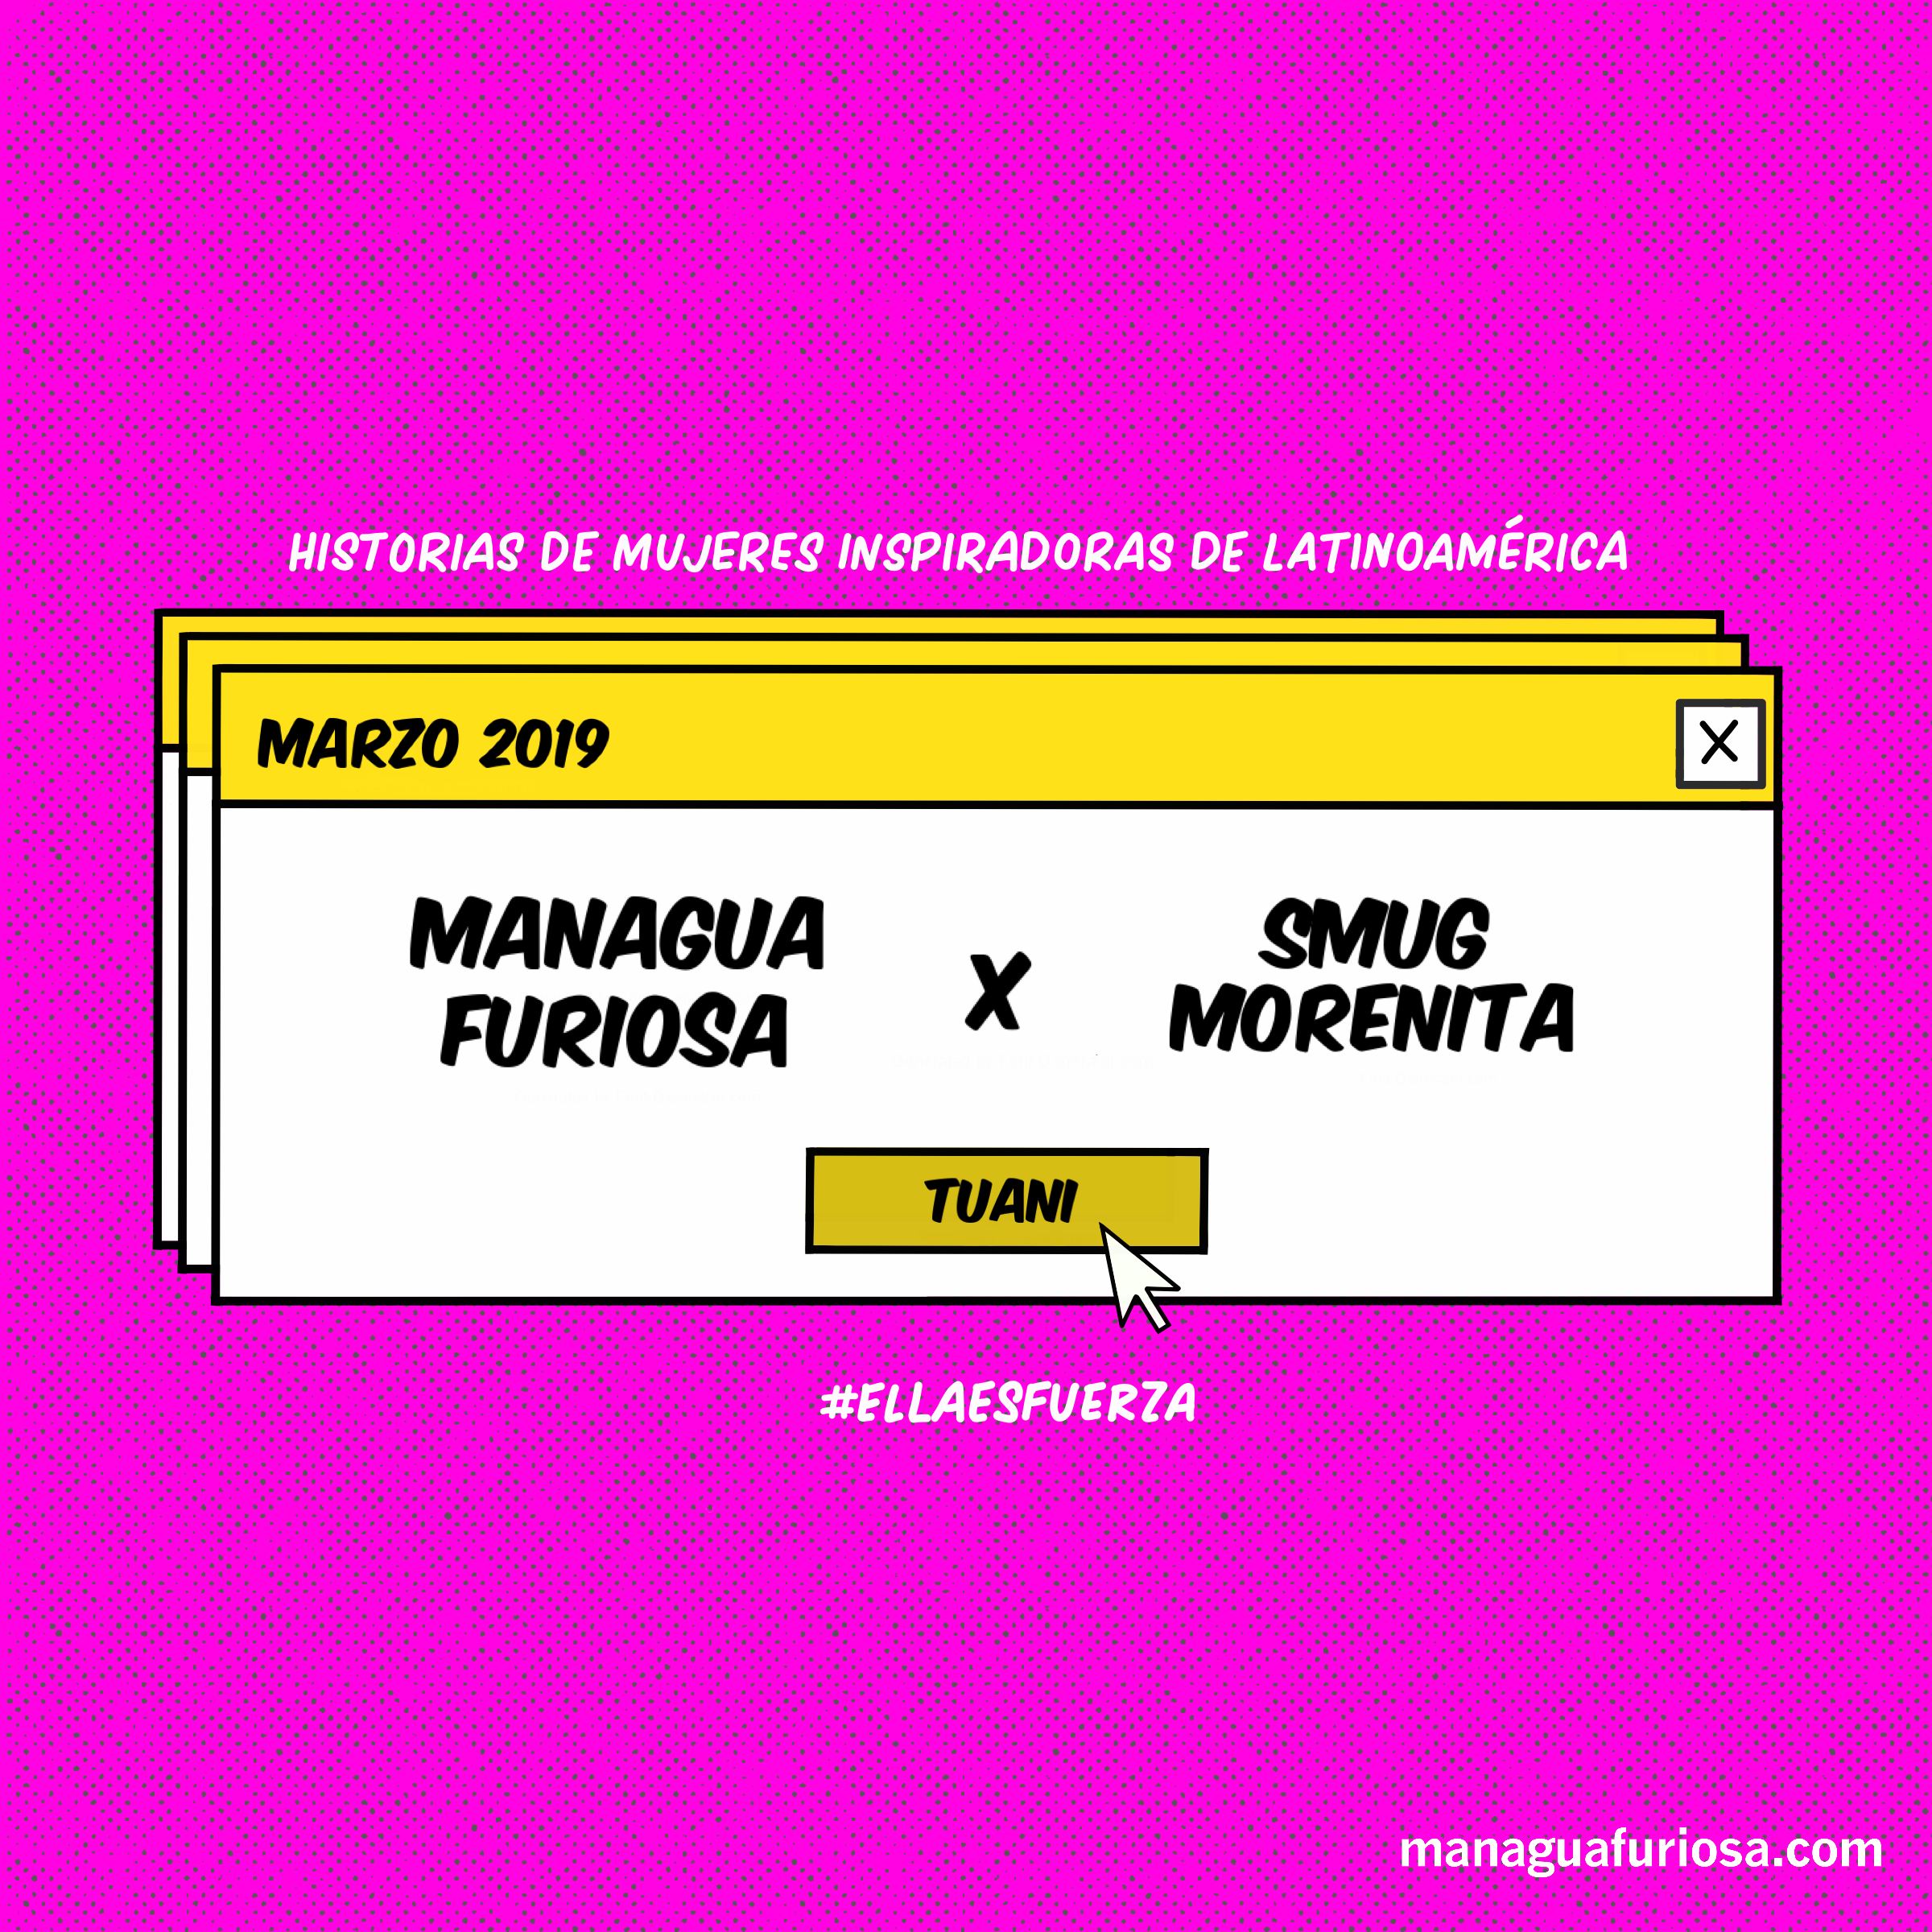 MANAGUA FURIOSAWOMENS HISTORY MONTH - managuafuriosa.com | IG: @managuafuriosa